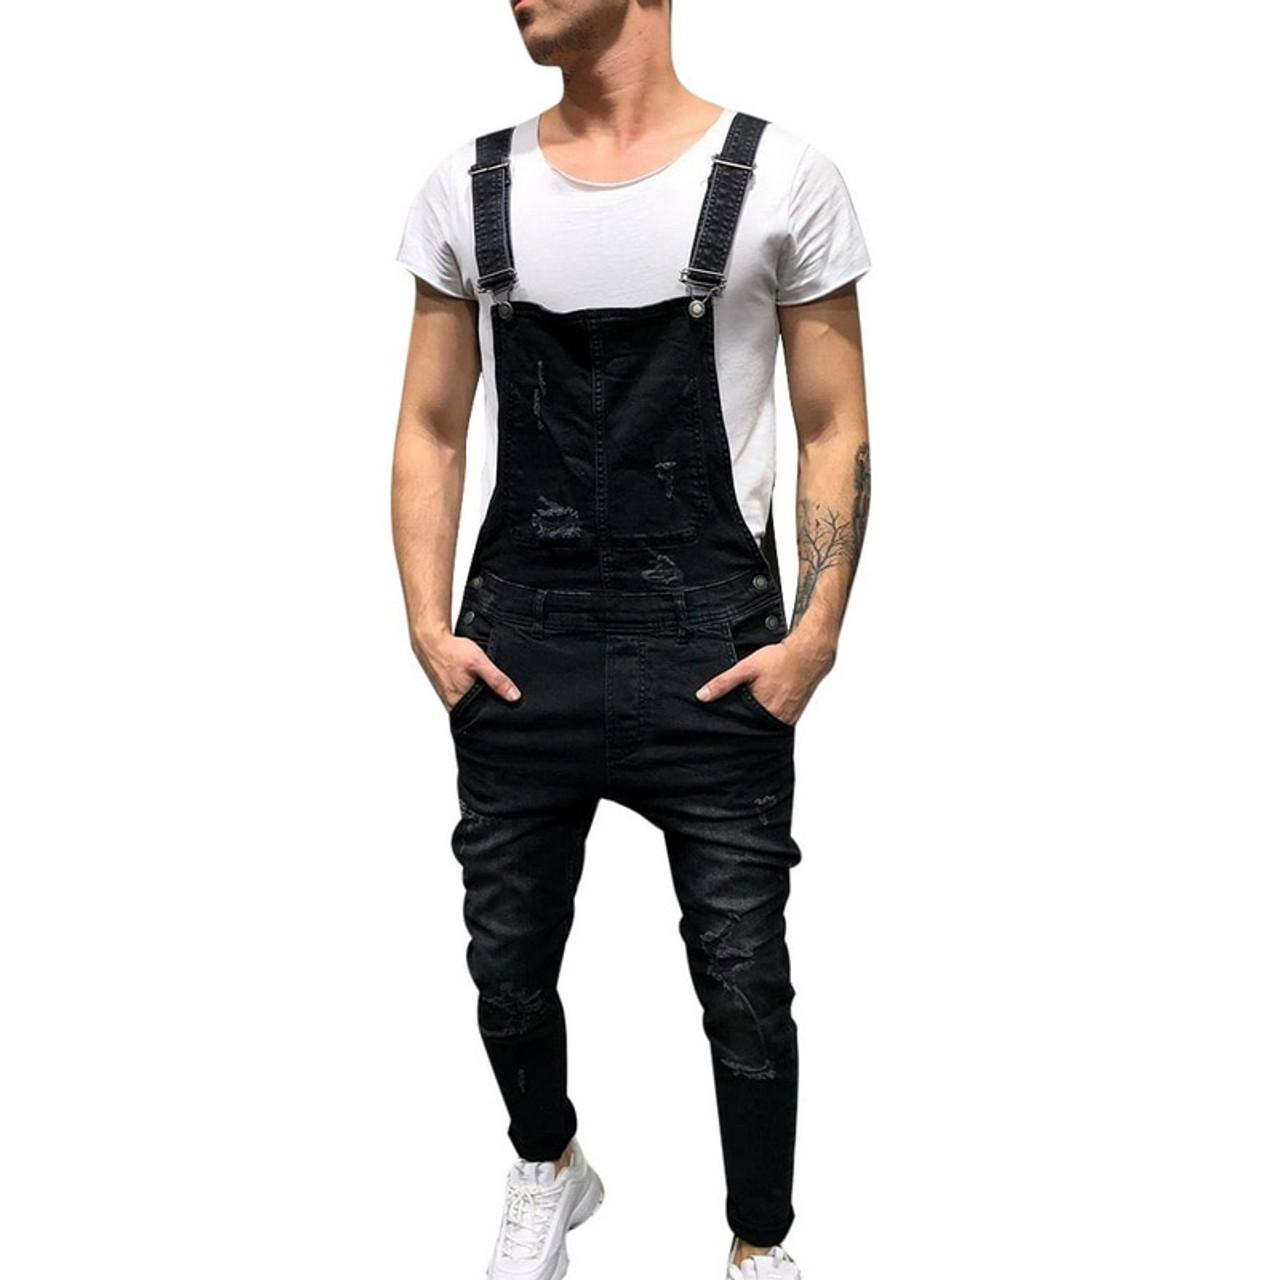 23d0a4c1b50 MoneRffi Mens Ripped Jeans Jumpsuits Spring Autumn Skinny Distressed Denim  Bib Overalls Male Suspender Pant Streetwear ...